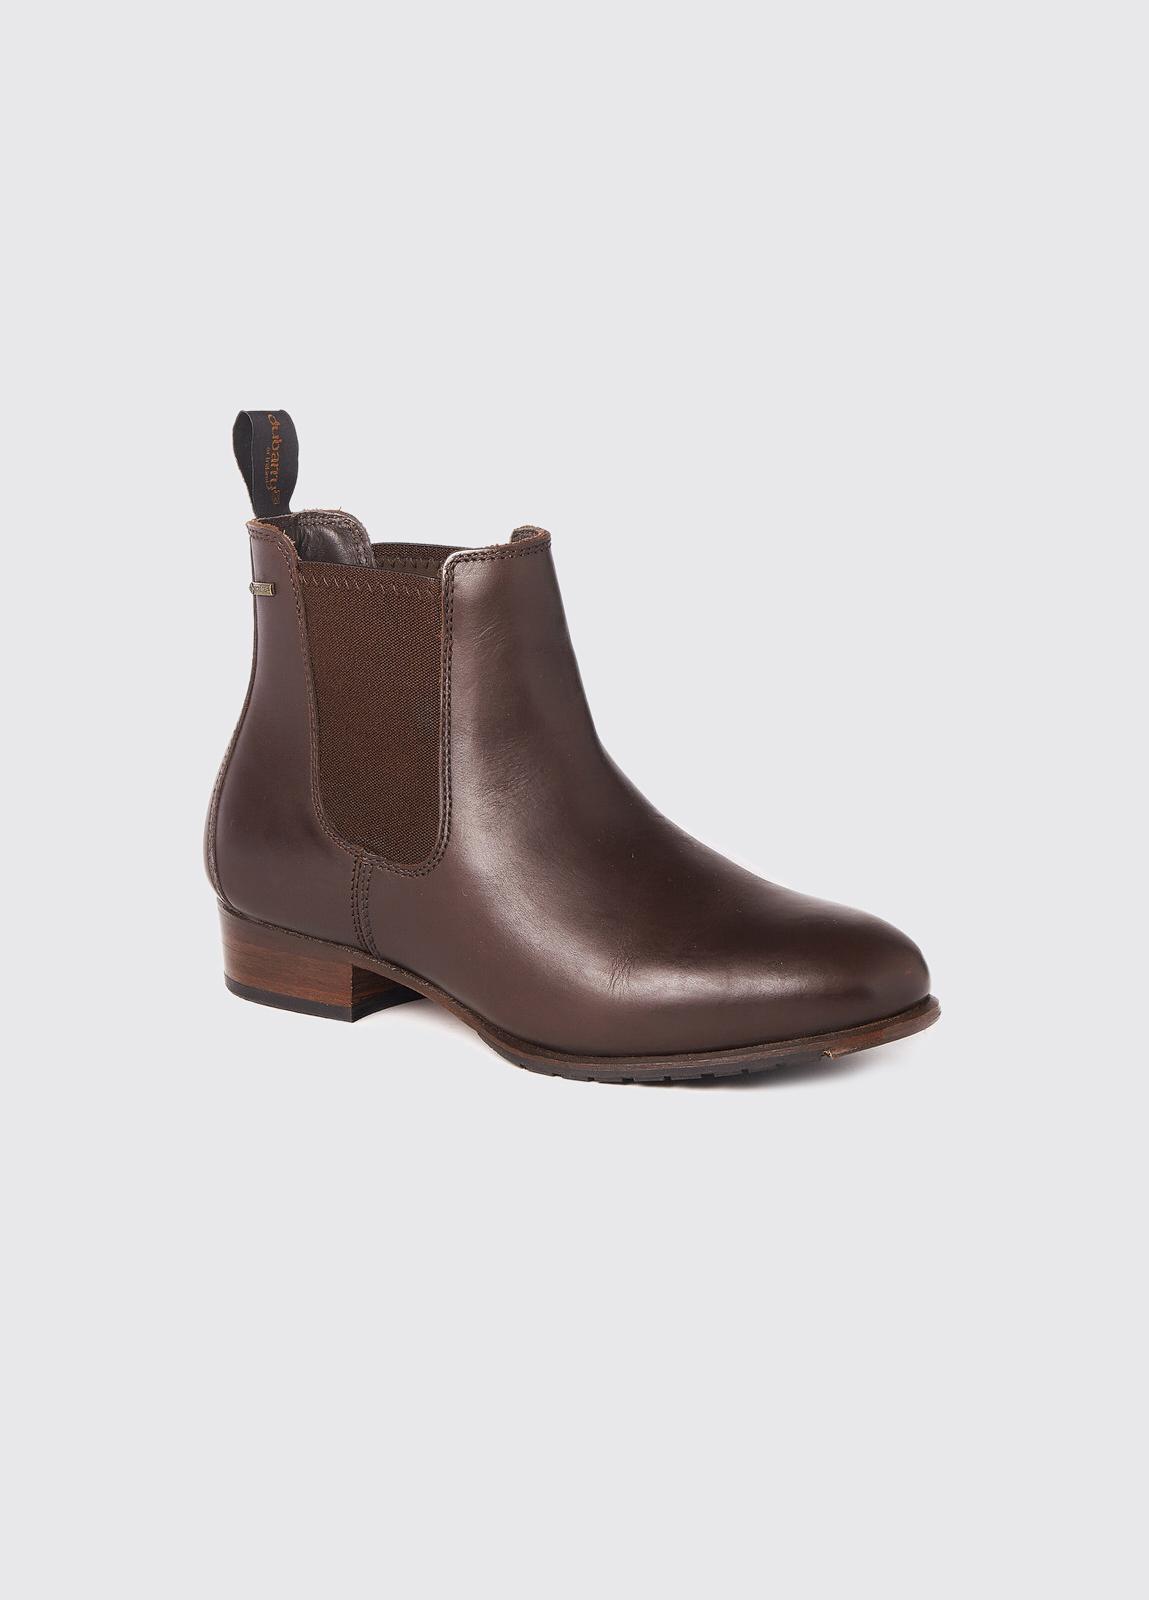 Cork Leather Soled Boot - Mahogany